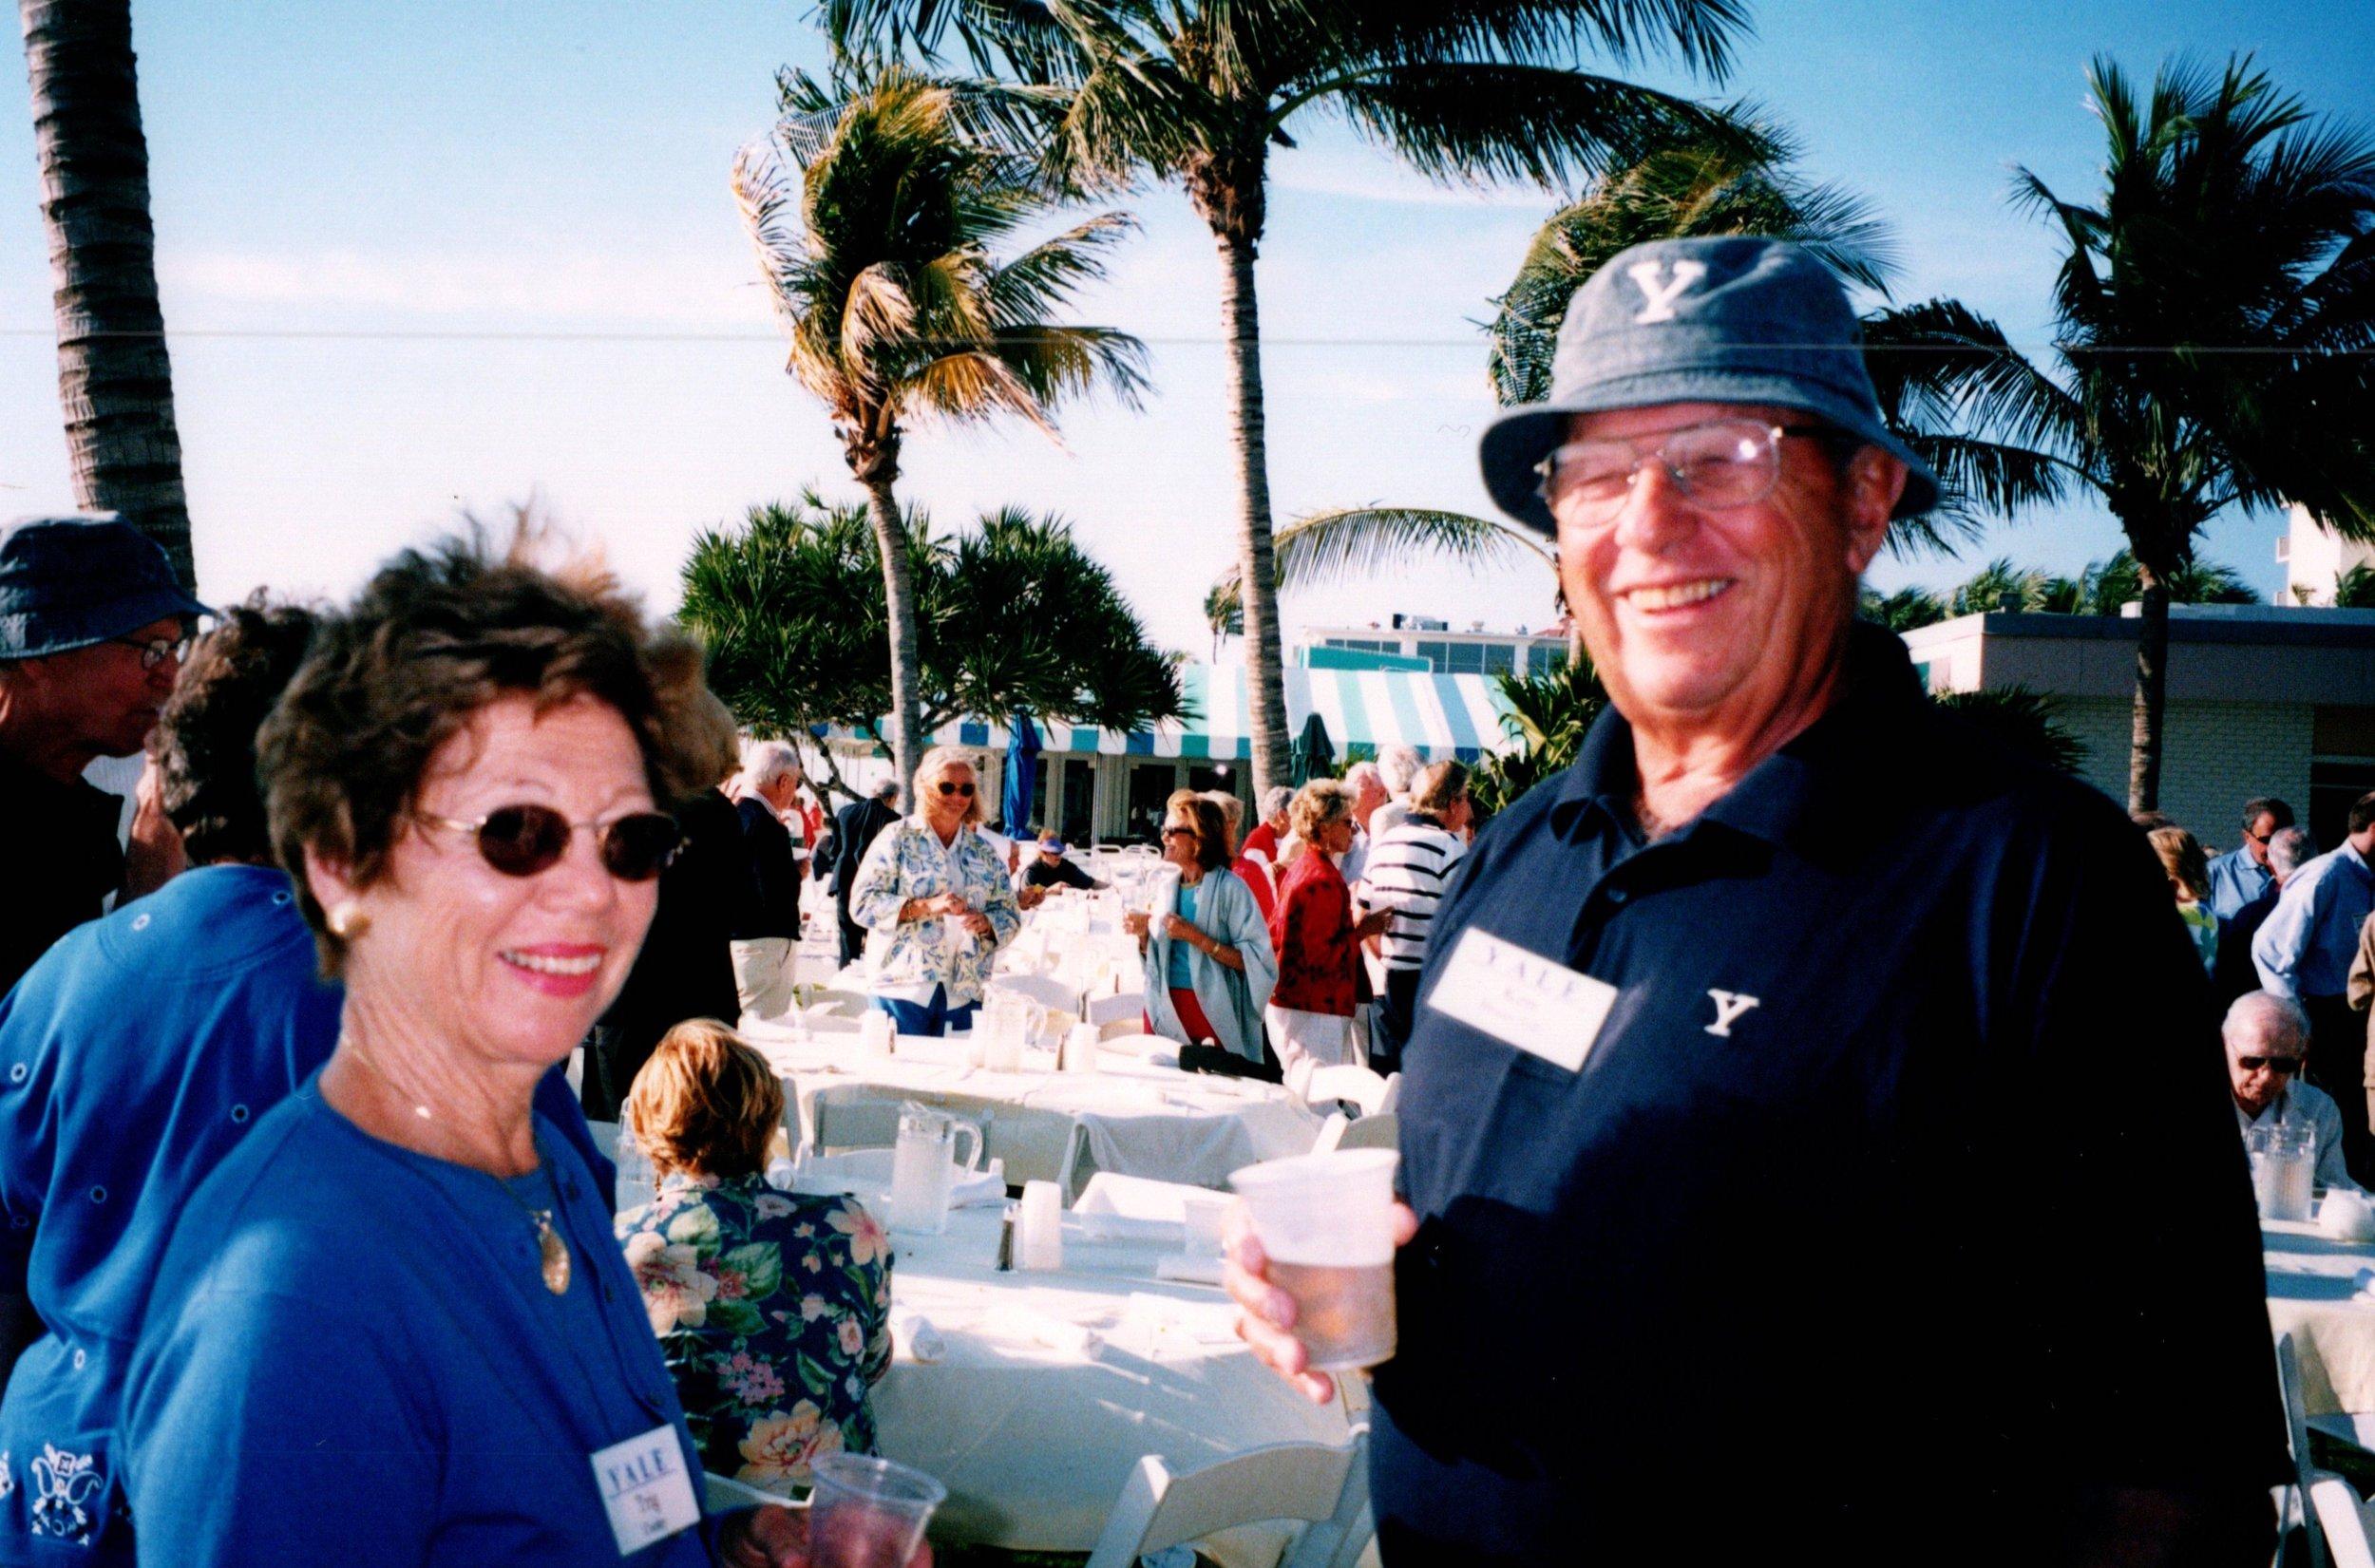 4_ 4_2004 - IVY LEAGUE PICNIC - NAPLES BEACH HOTEL 7.jpg